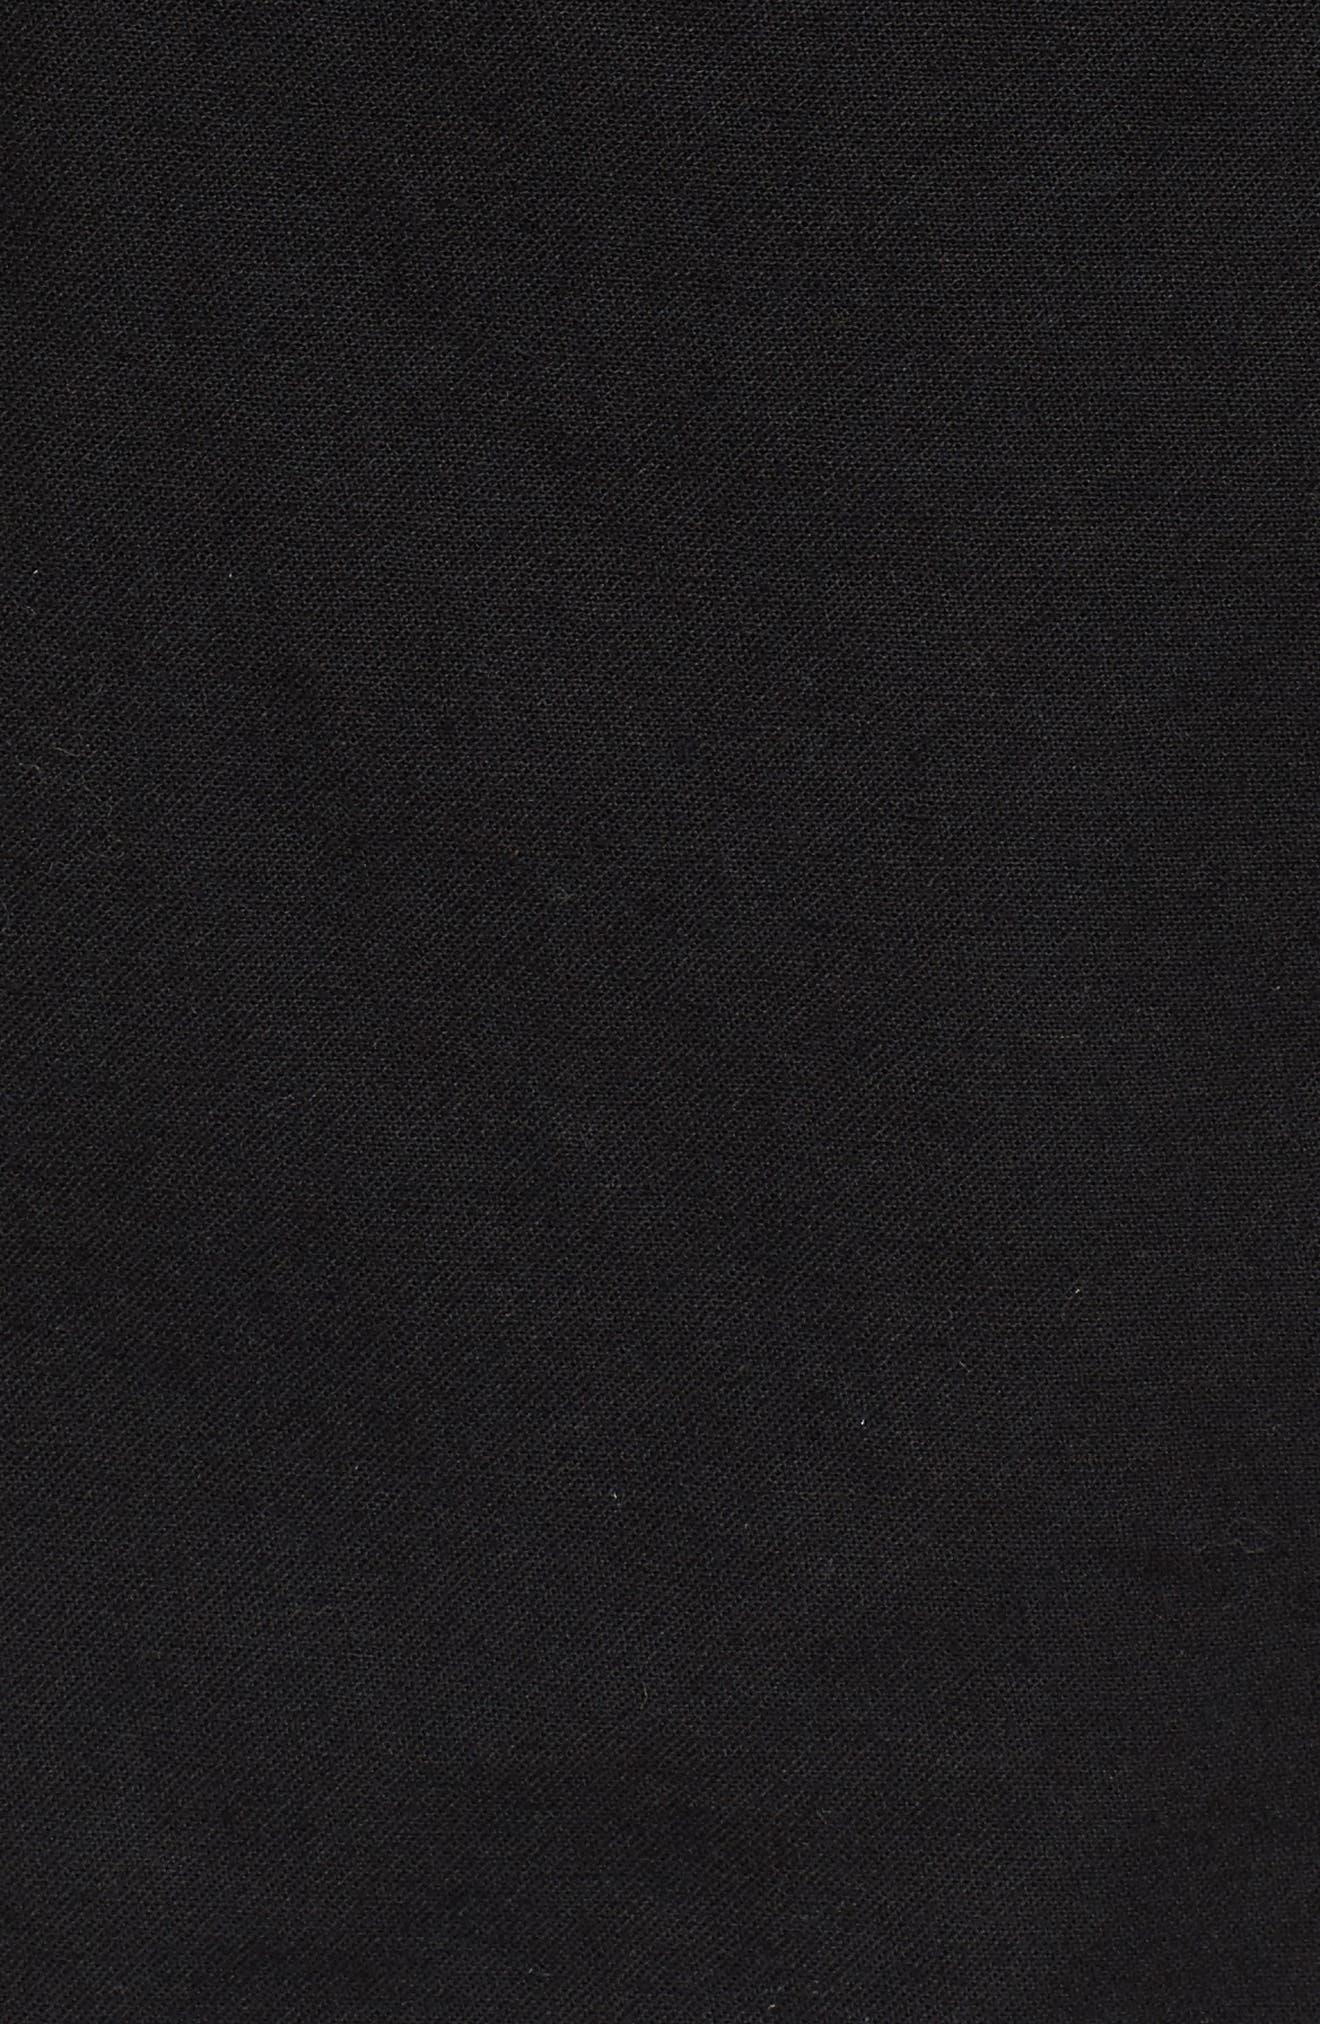 Fusion Field Coat,                             Alternate thumbnail 5, color,                             Black/ Sage